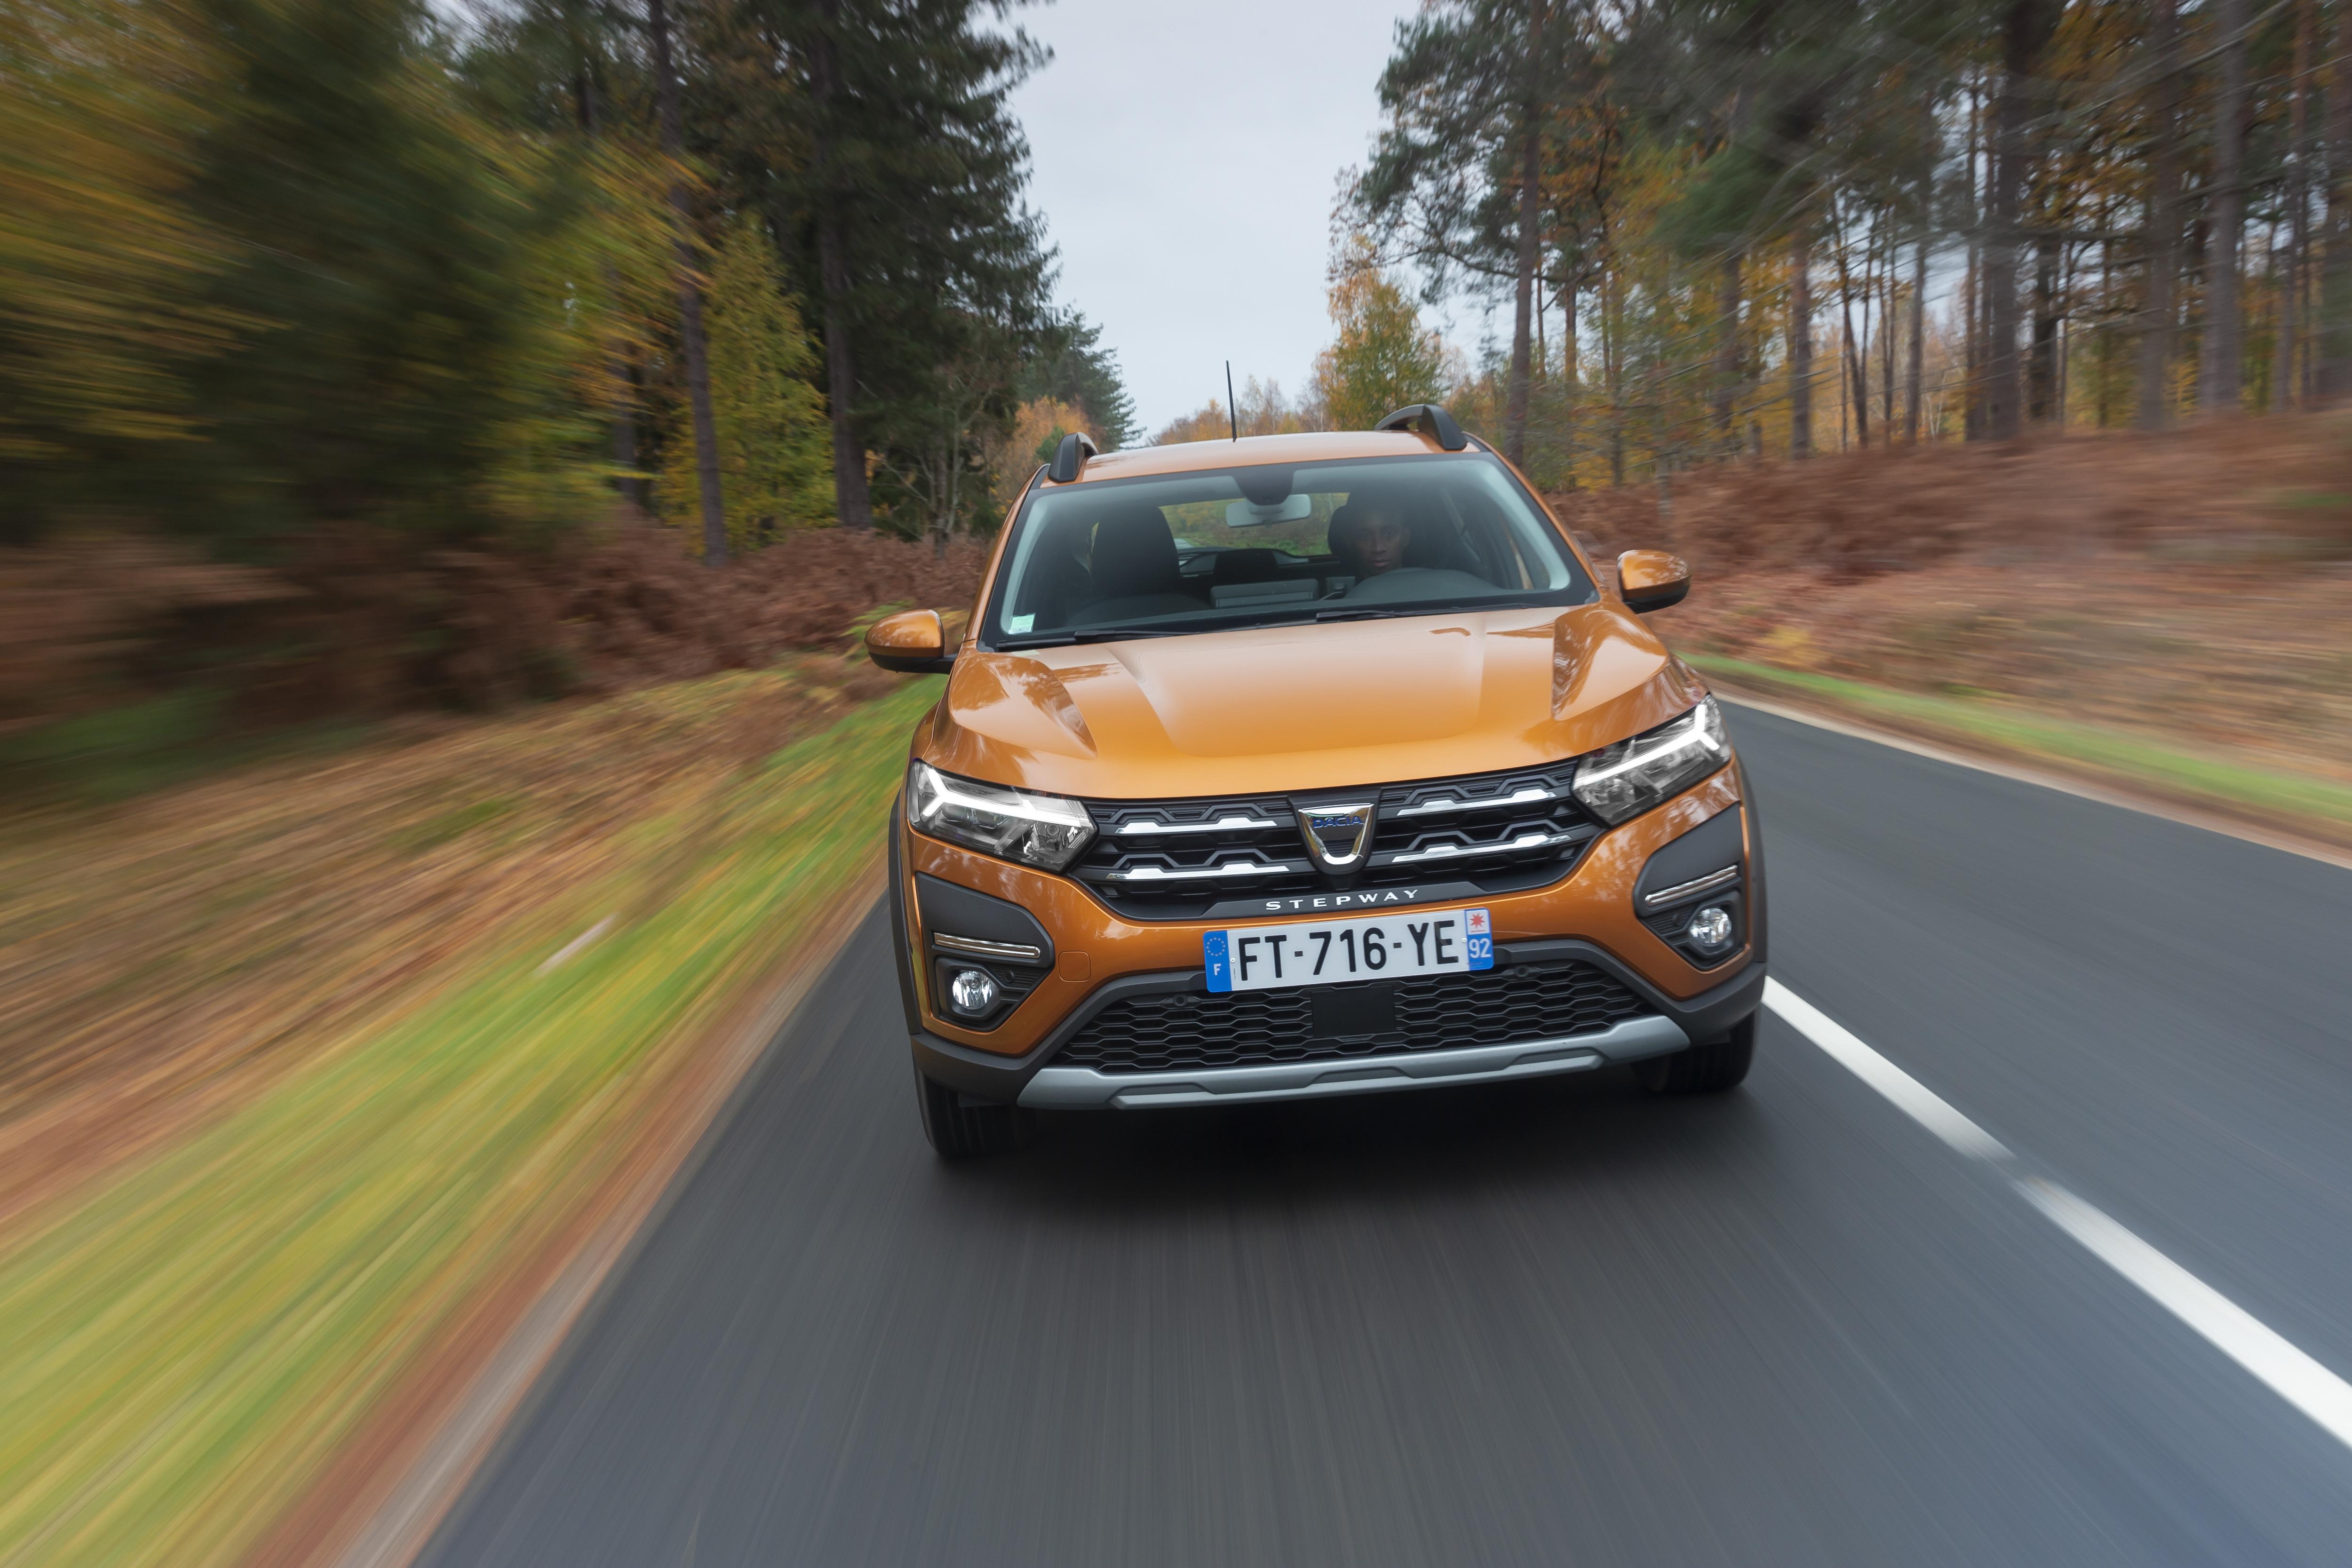 2020 - Essais presse Nouvelle Dacia SANDERO STEPWAY (8)